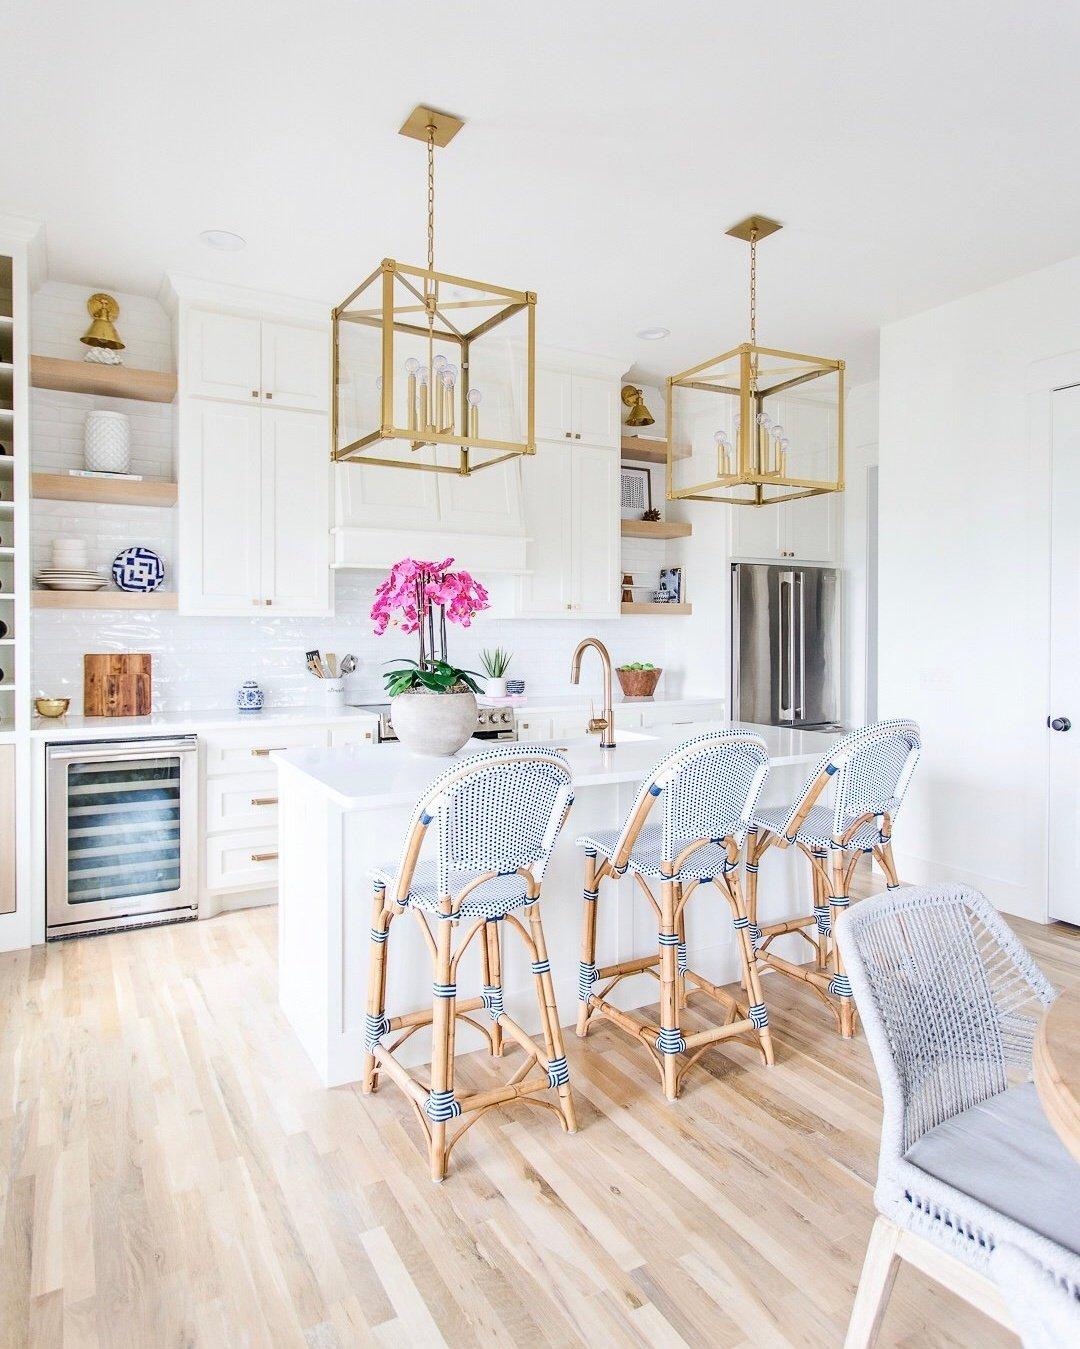 los ángeles interior decor acme real estate shelves scandinavian bungalow minimal